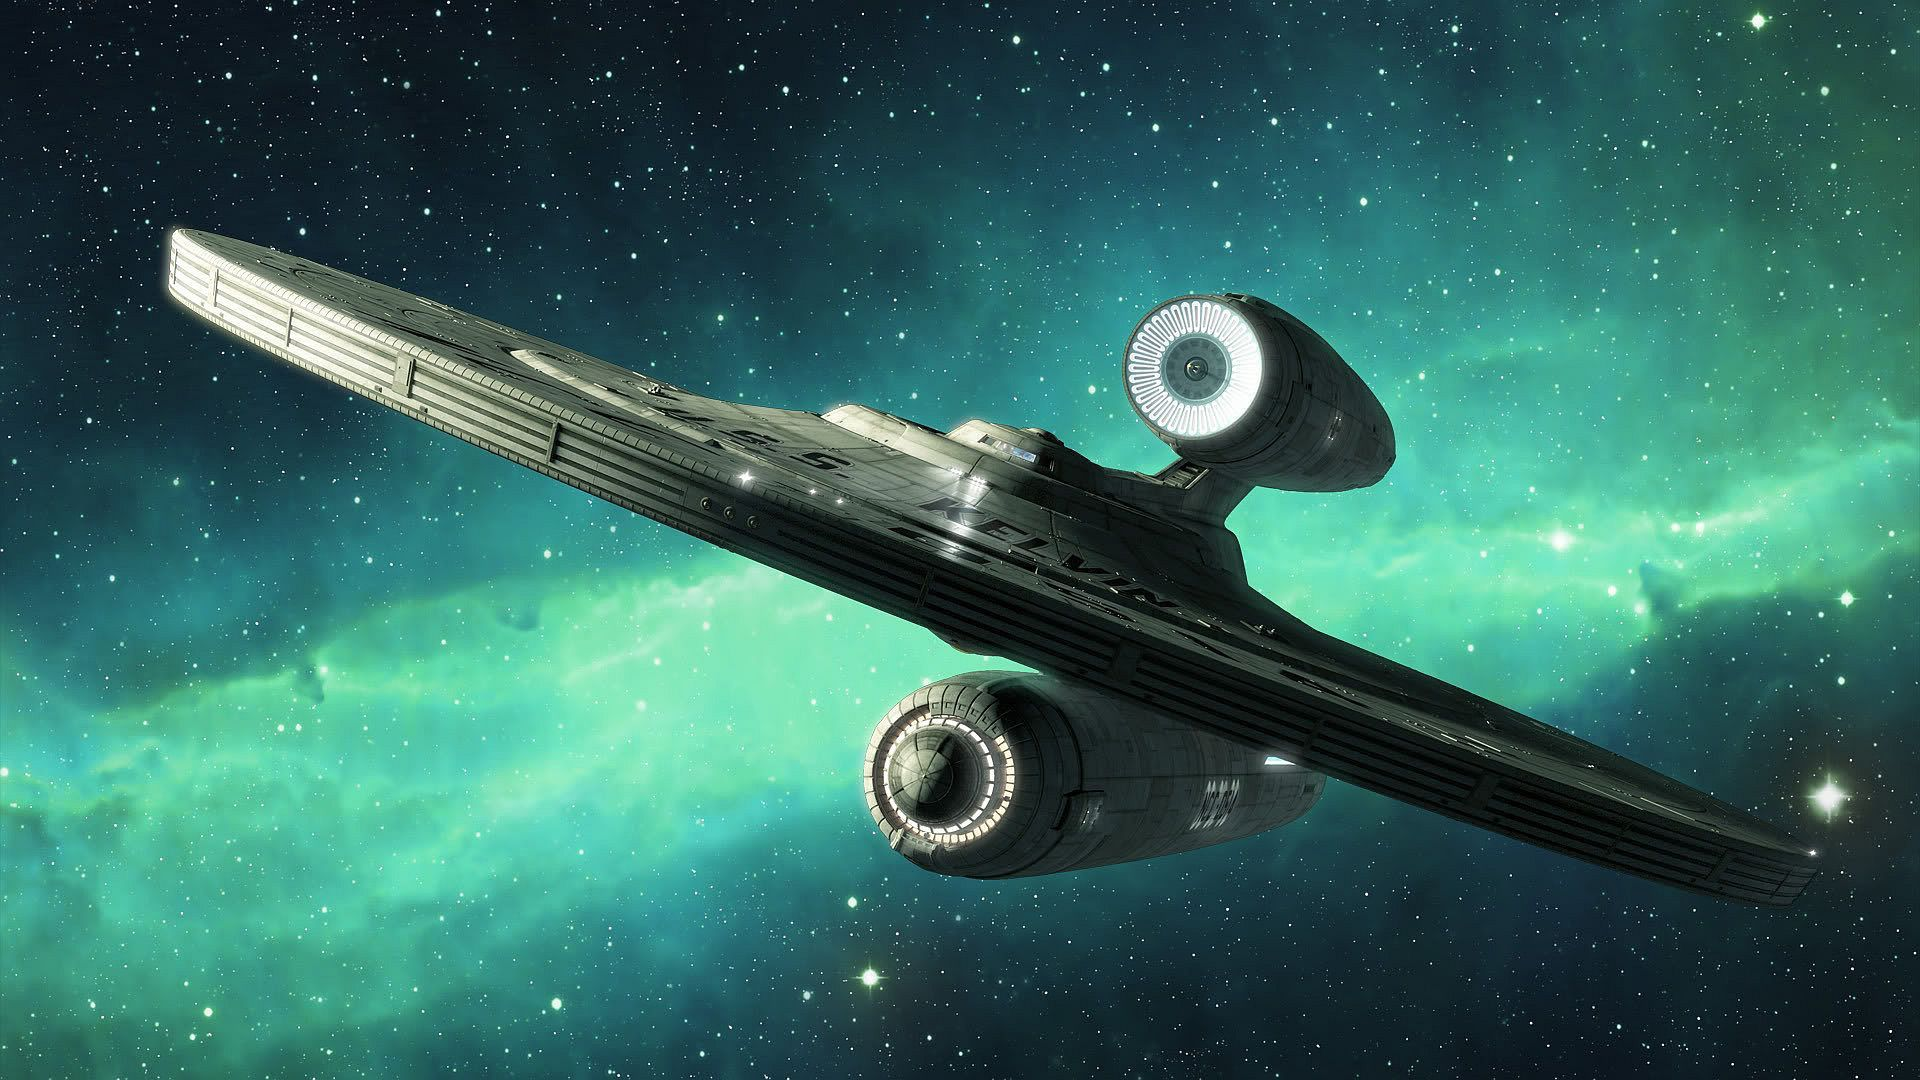 Fond Ecran Hd Wallpaper Hd Science Fiction77 All Images Star Trek Wallpaper Star Trek Art Star Trek Starships